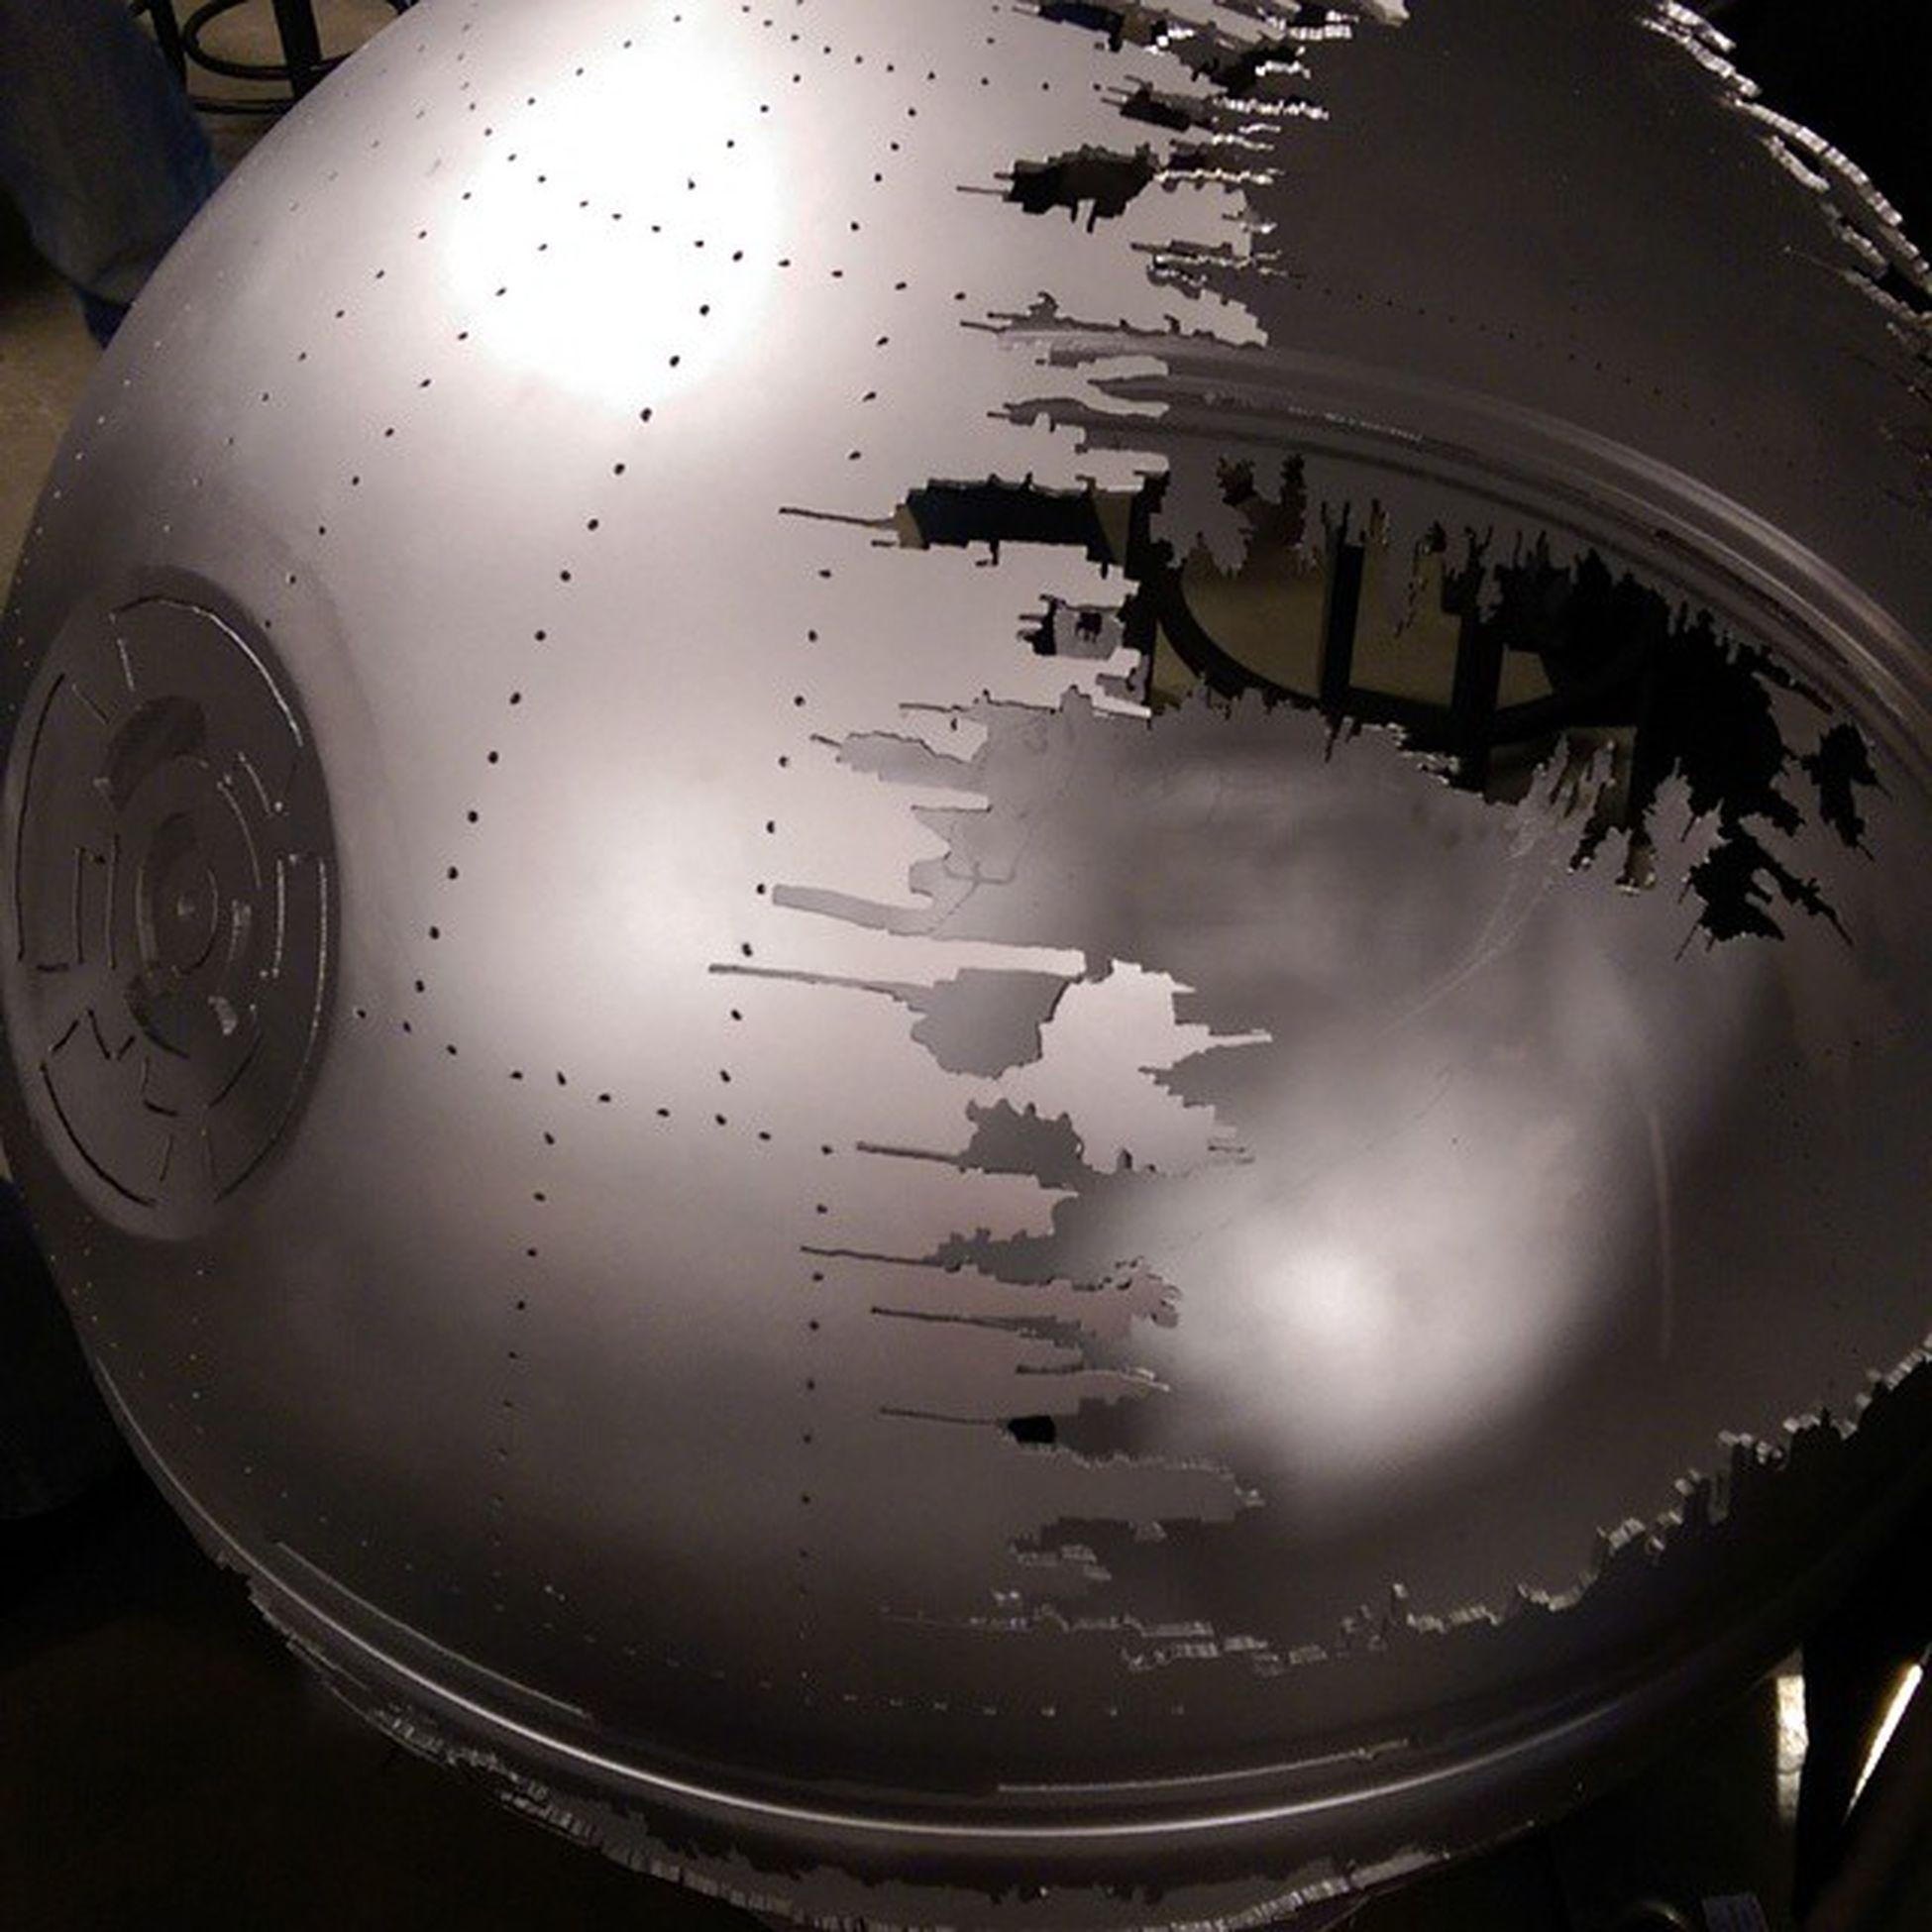 Yep, I'm breaking down and getting the Death Star firepit for the backyard. Starwars Imdoingit Bestofinstagram Deathstar